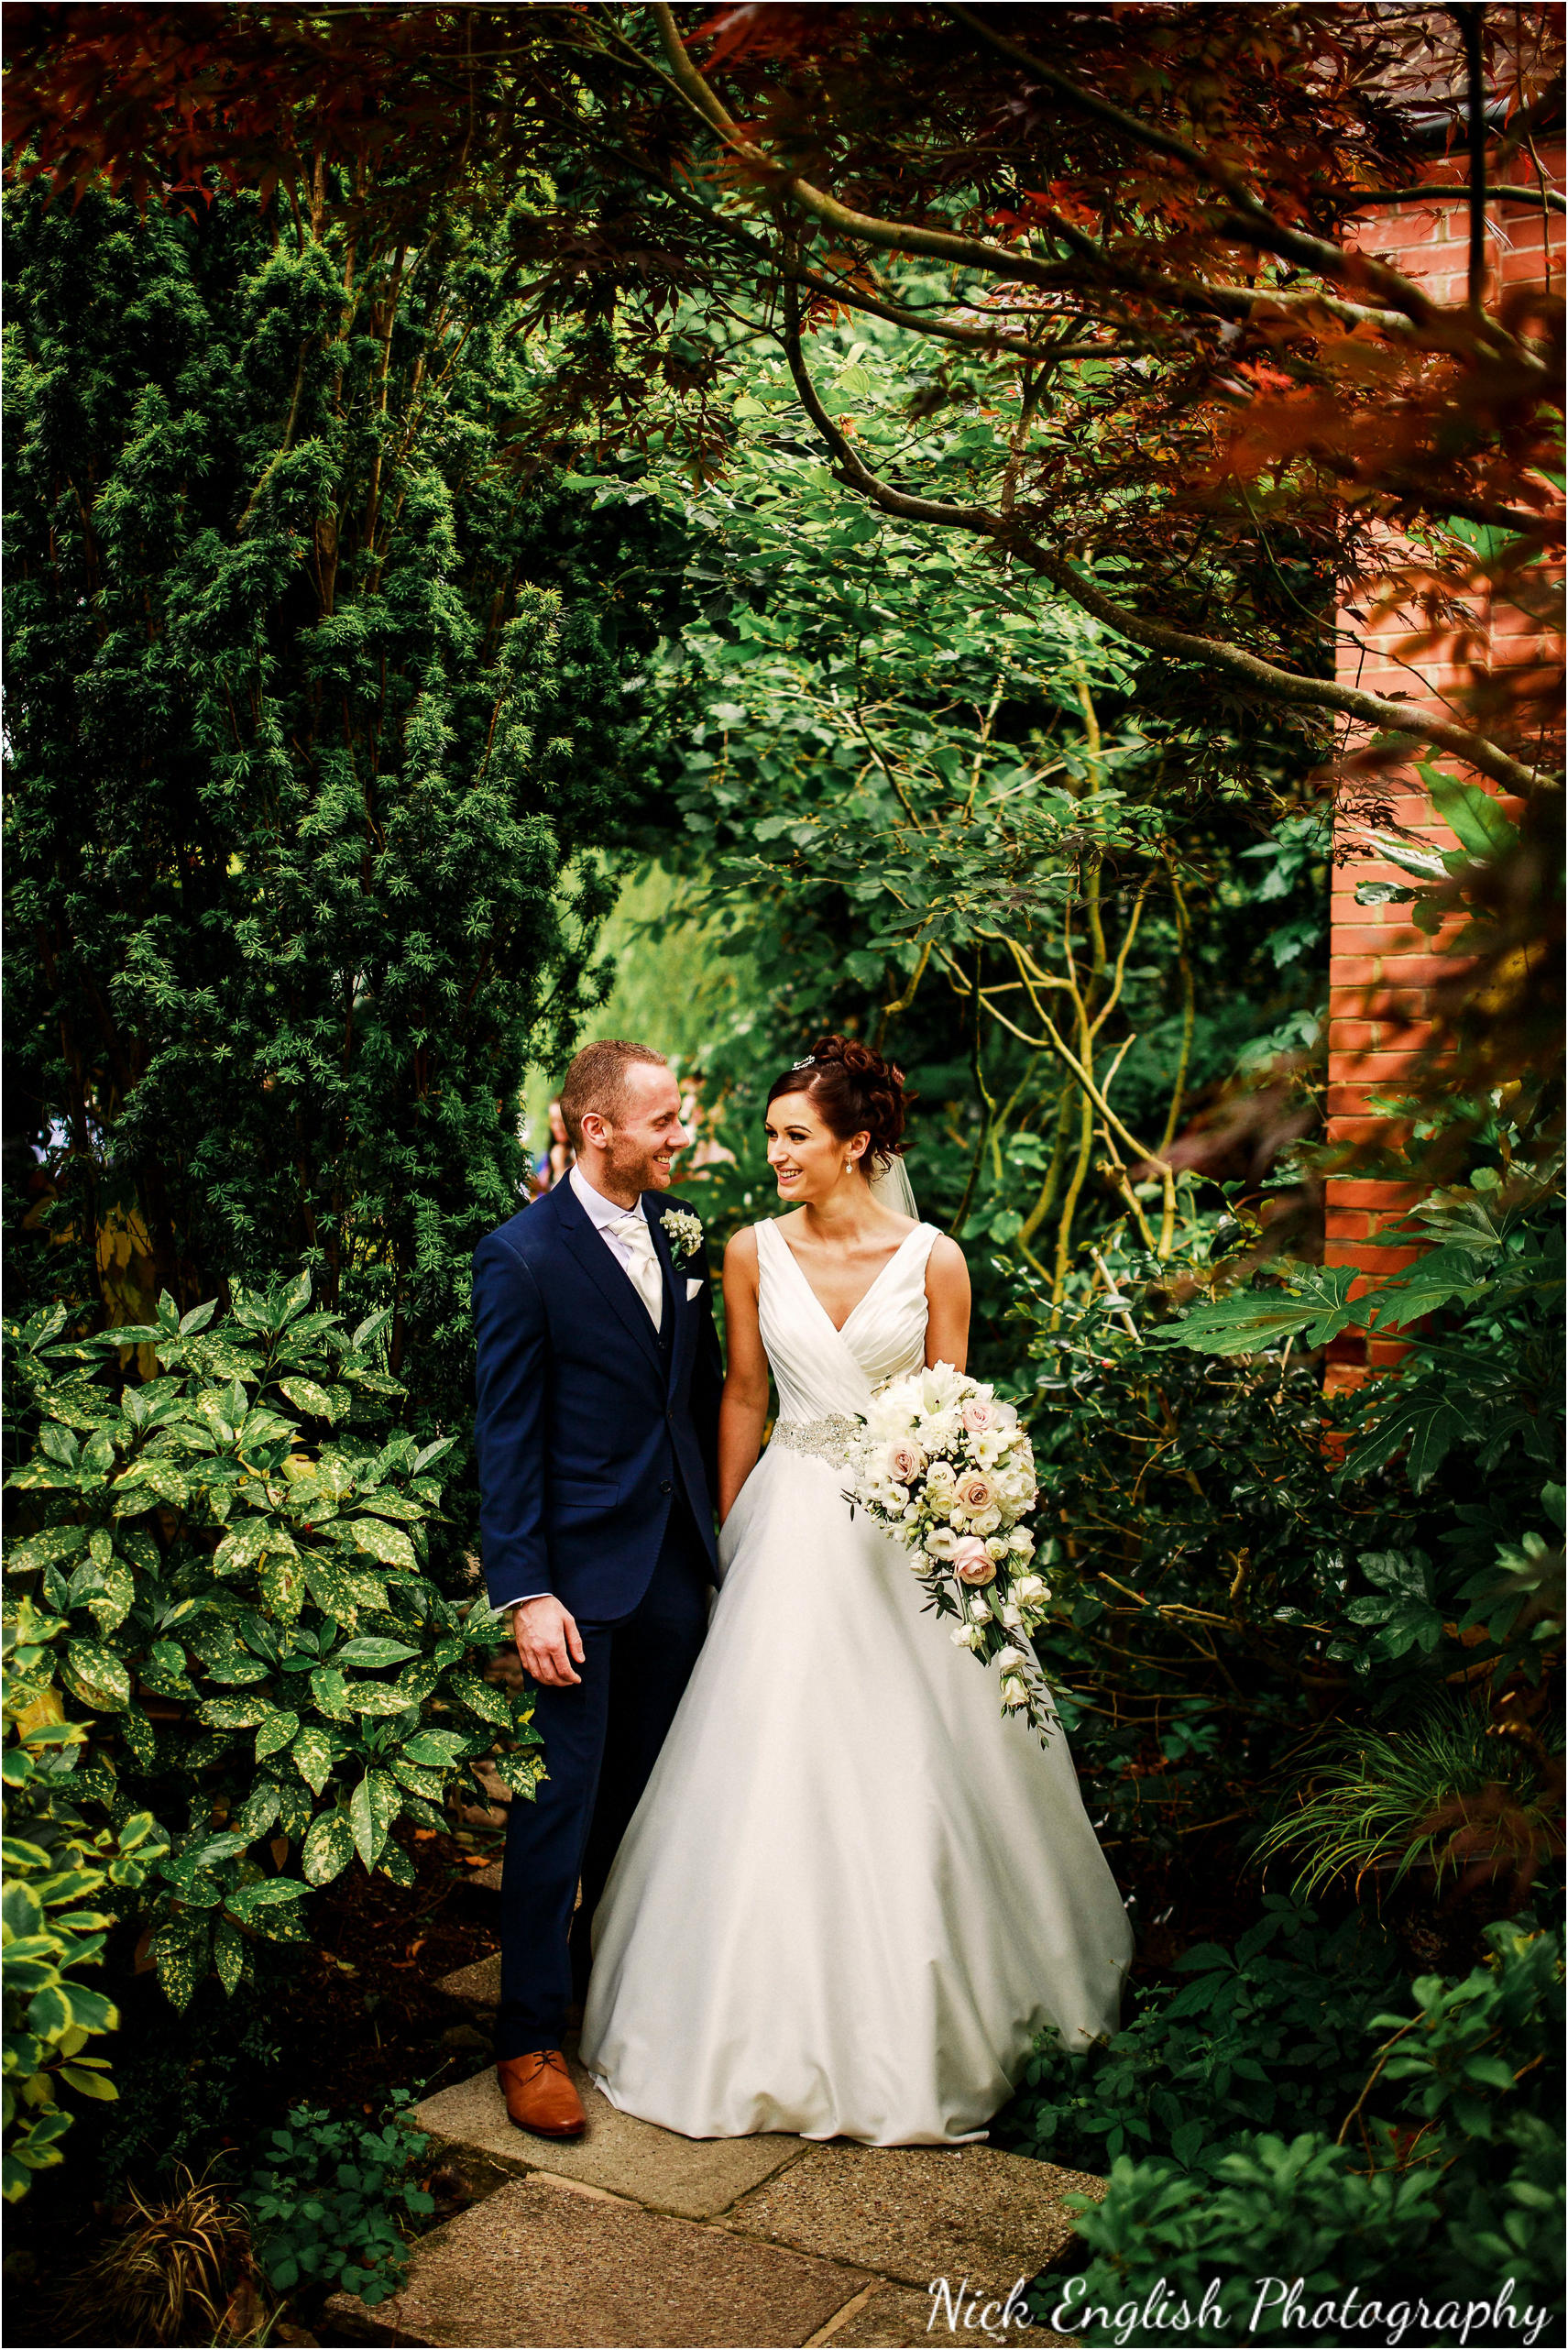 Emily David Wedding Photographs at Barton Grange Preston by Nick English Photography 140jpg.jpeg